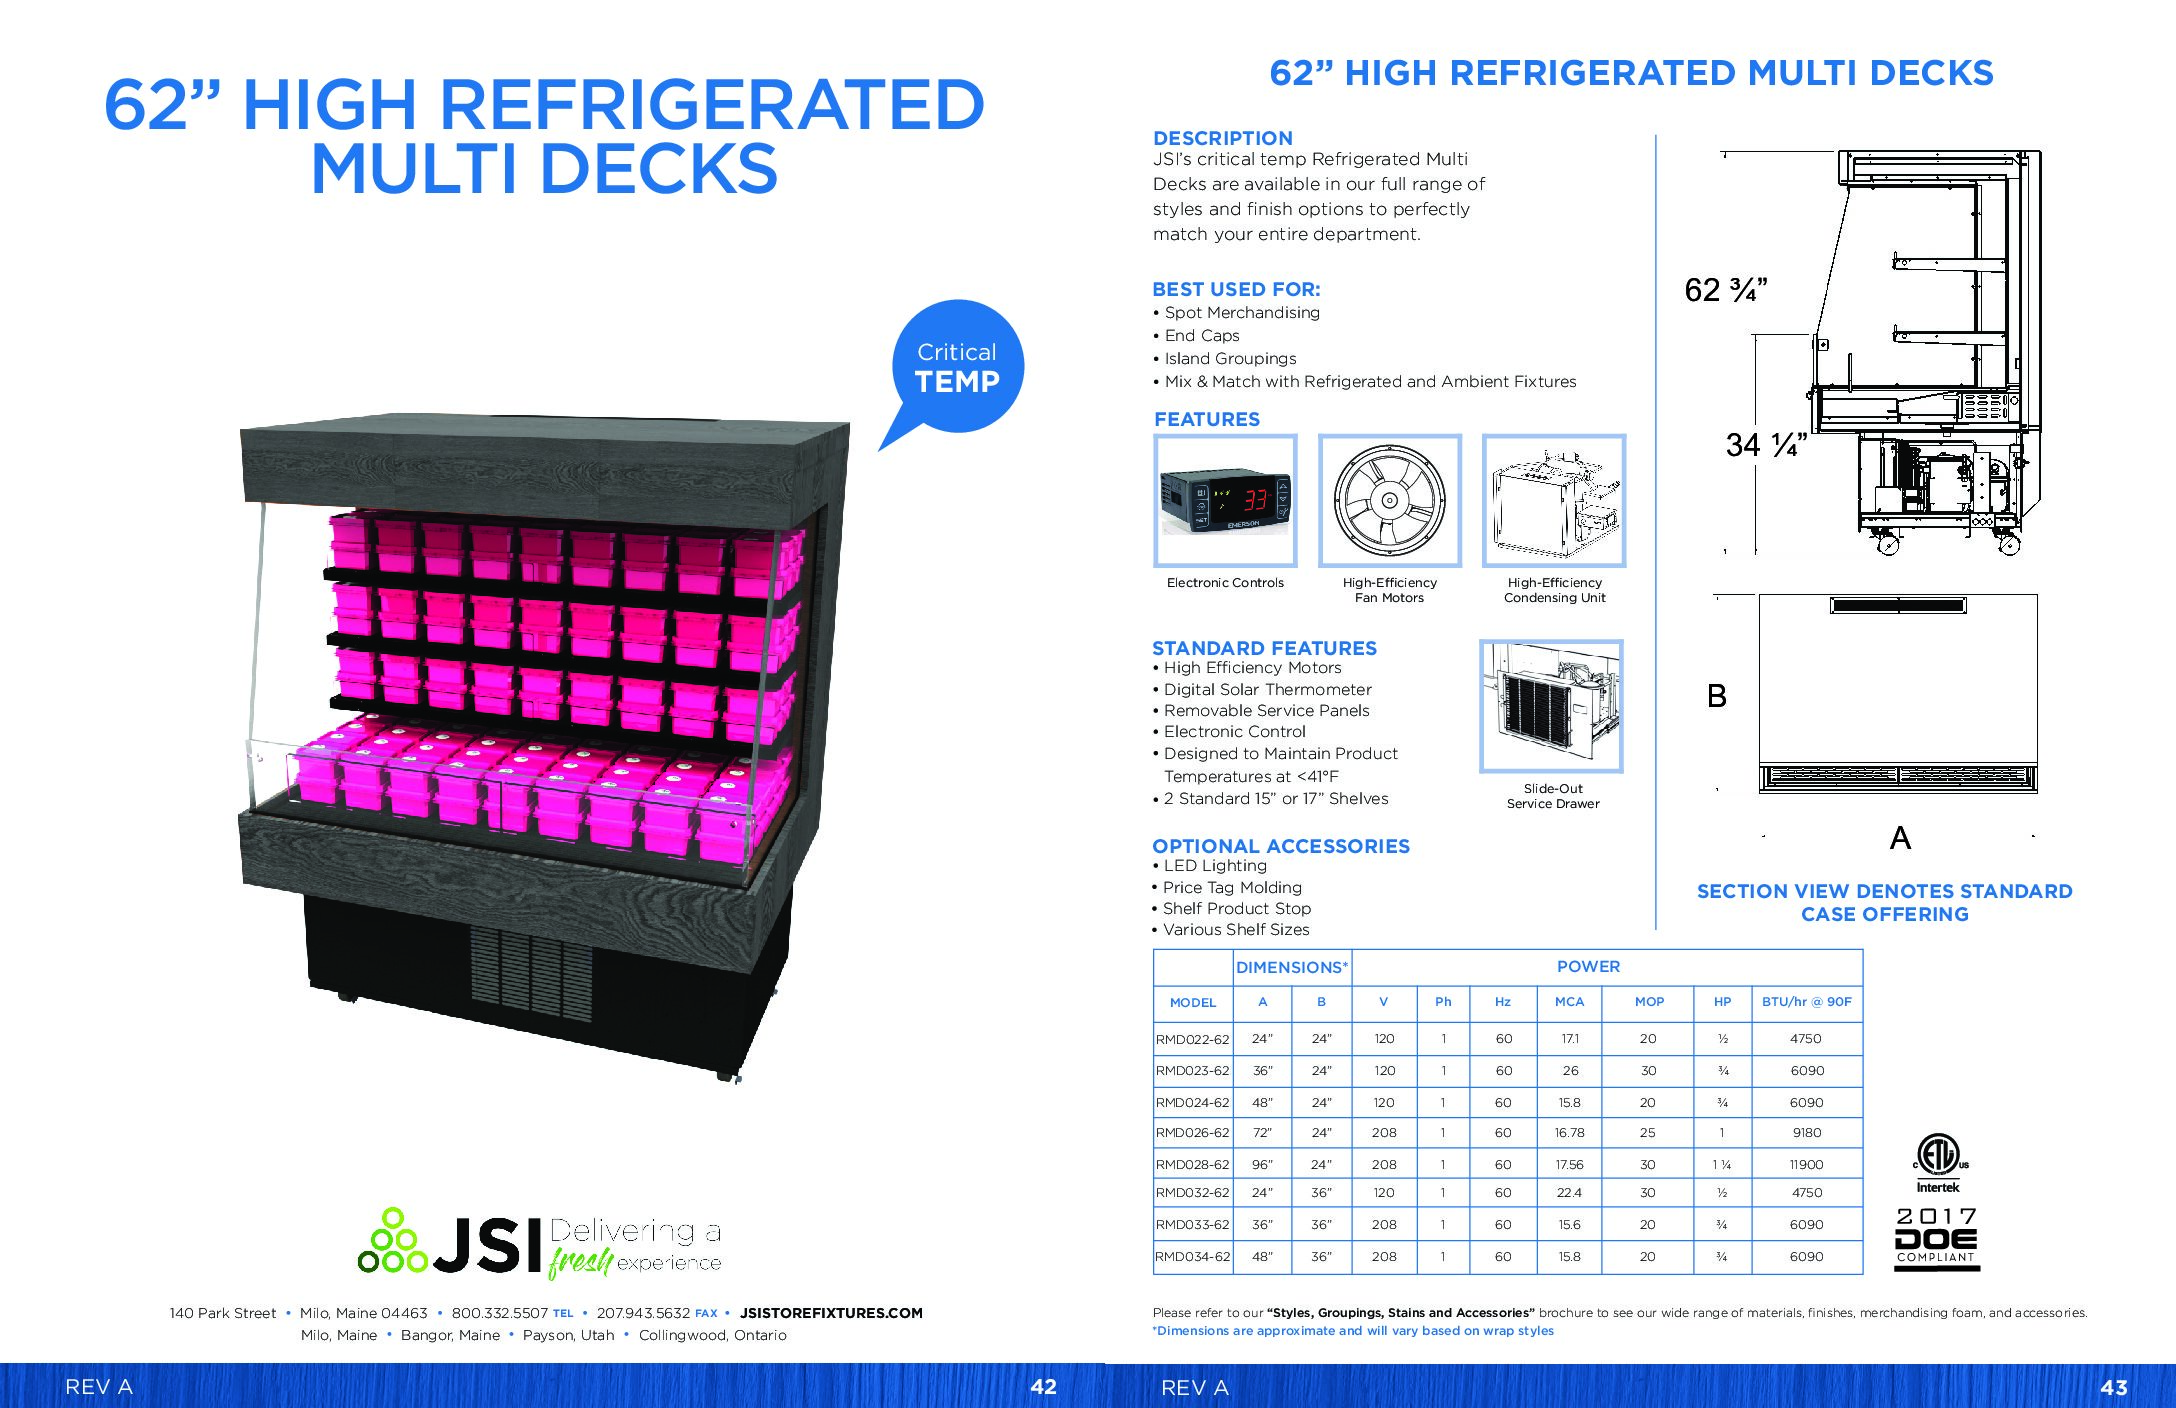 62in High Refrigerated Multi Decks (PDF)